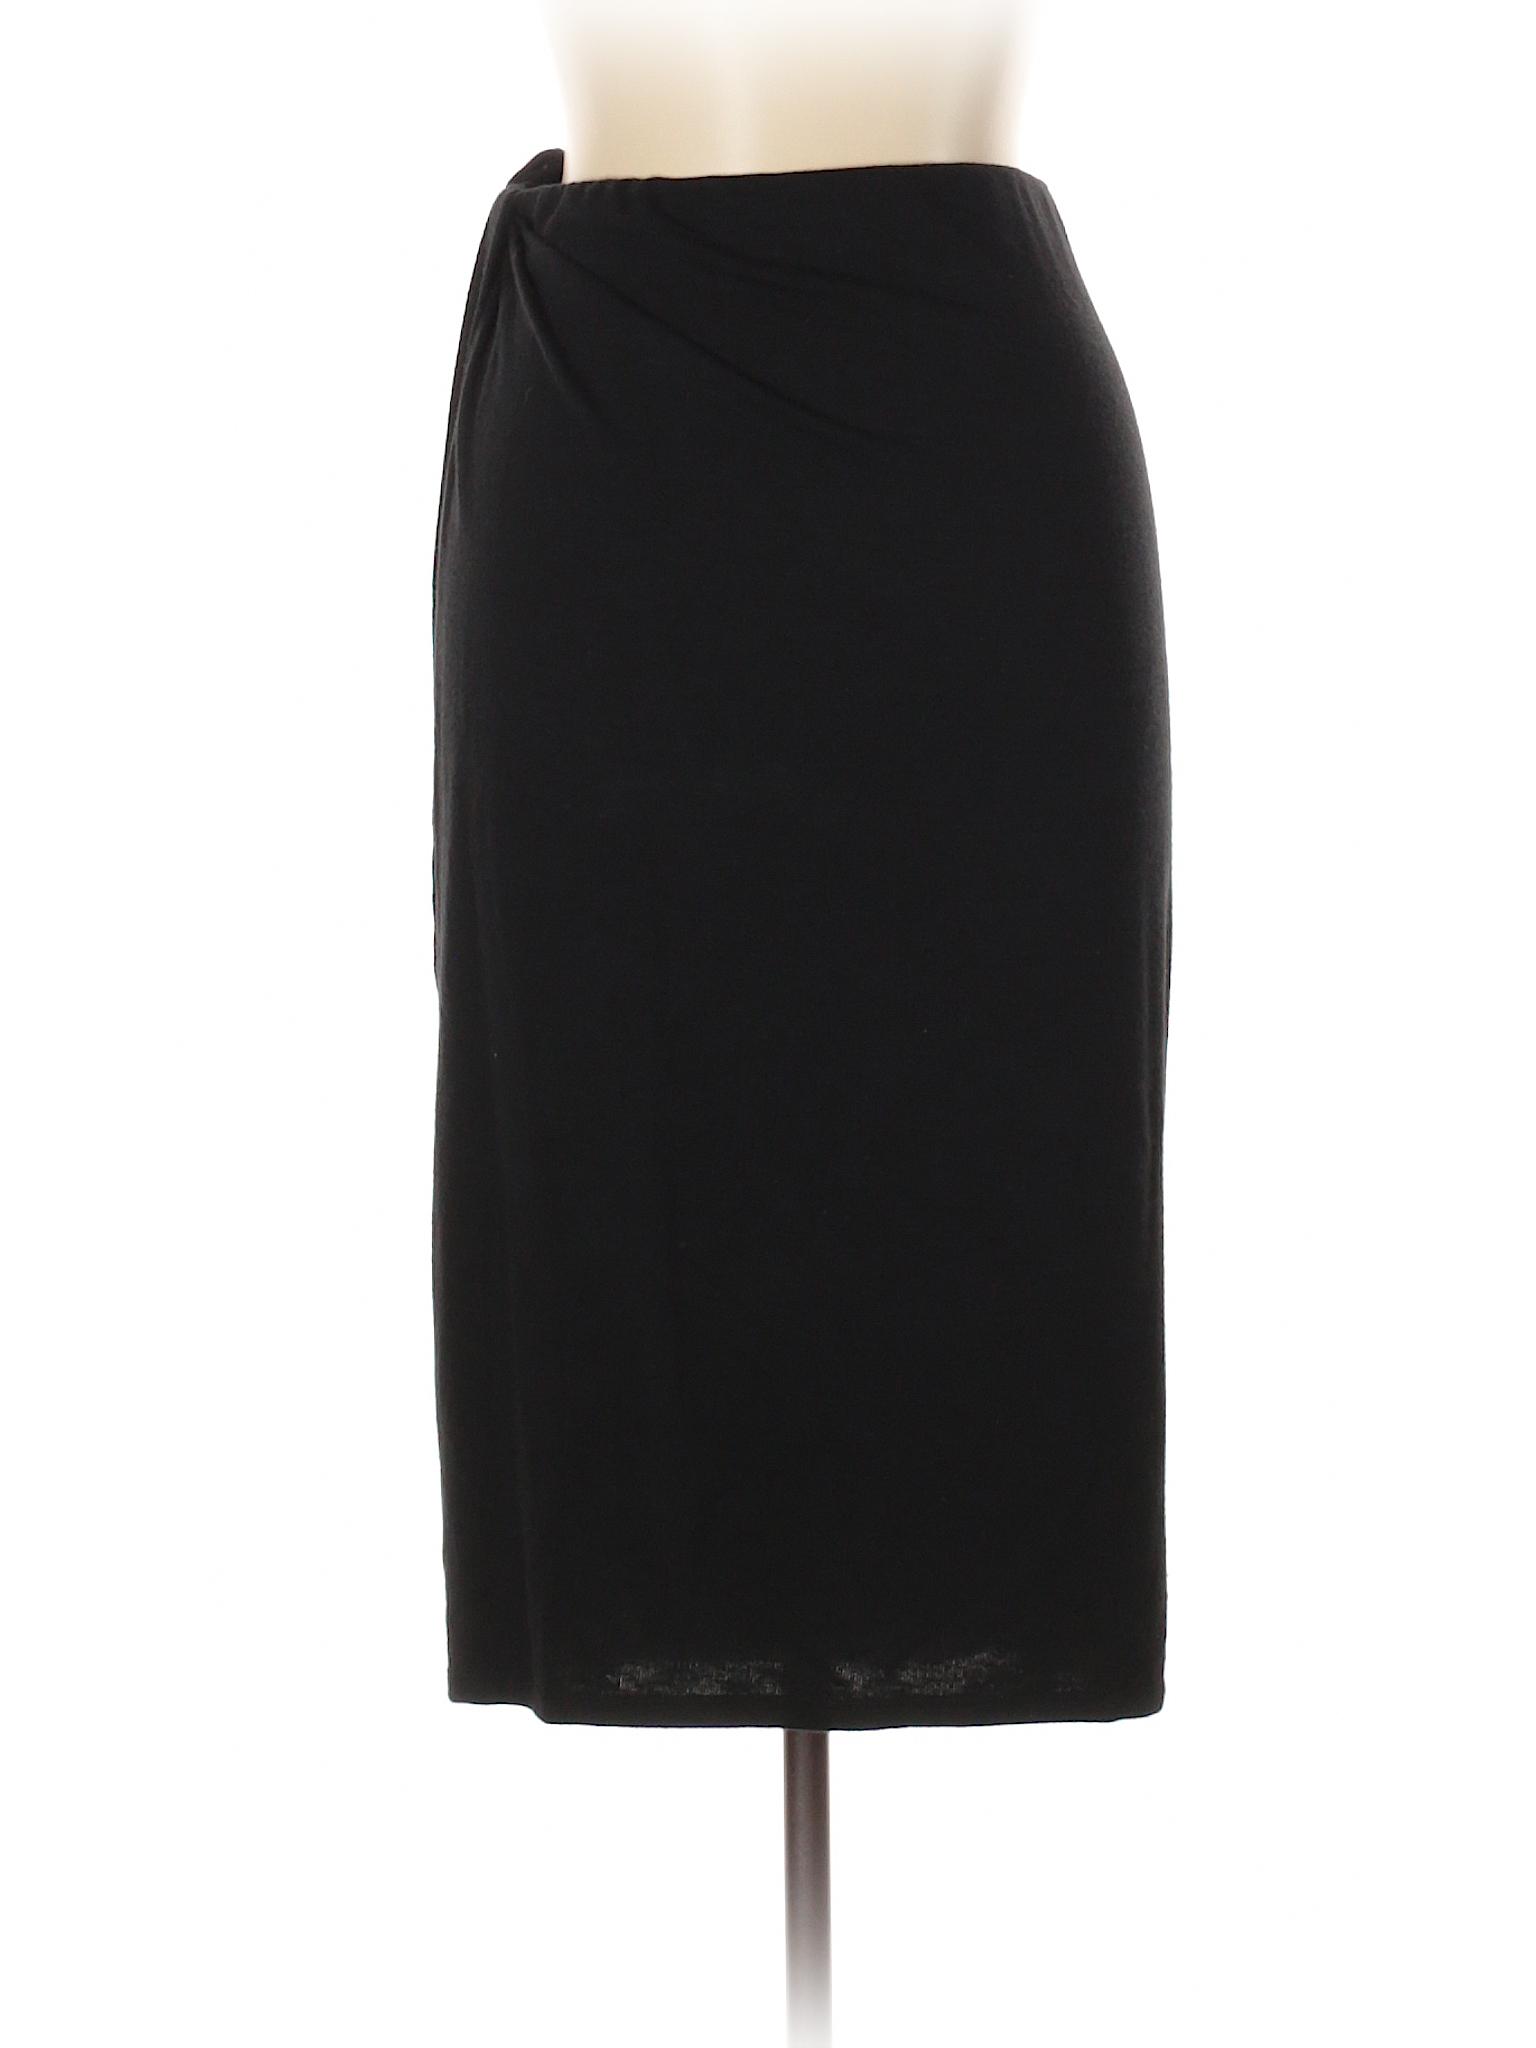 Bar Skirt winter Casual III Leisure UpSq54